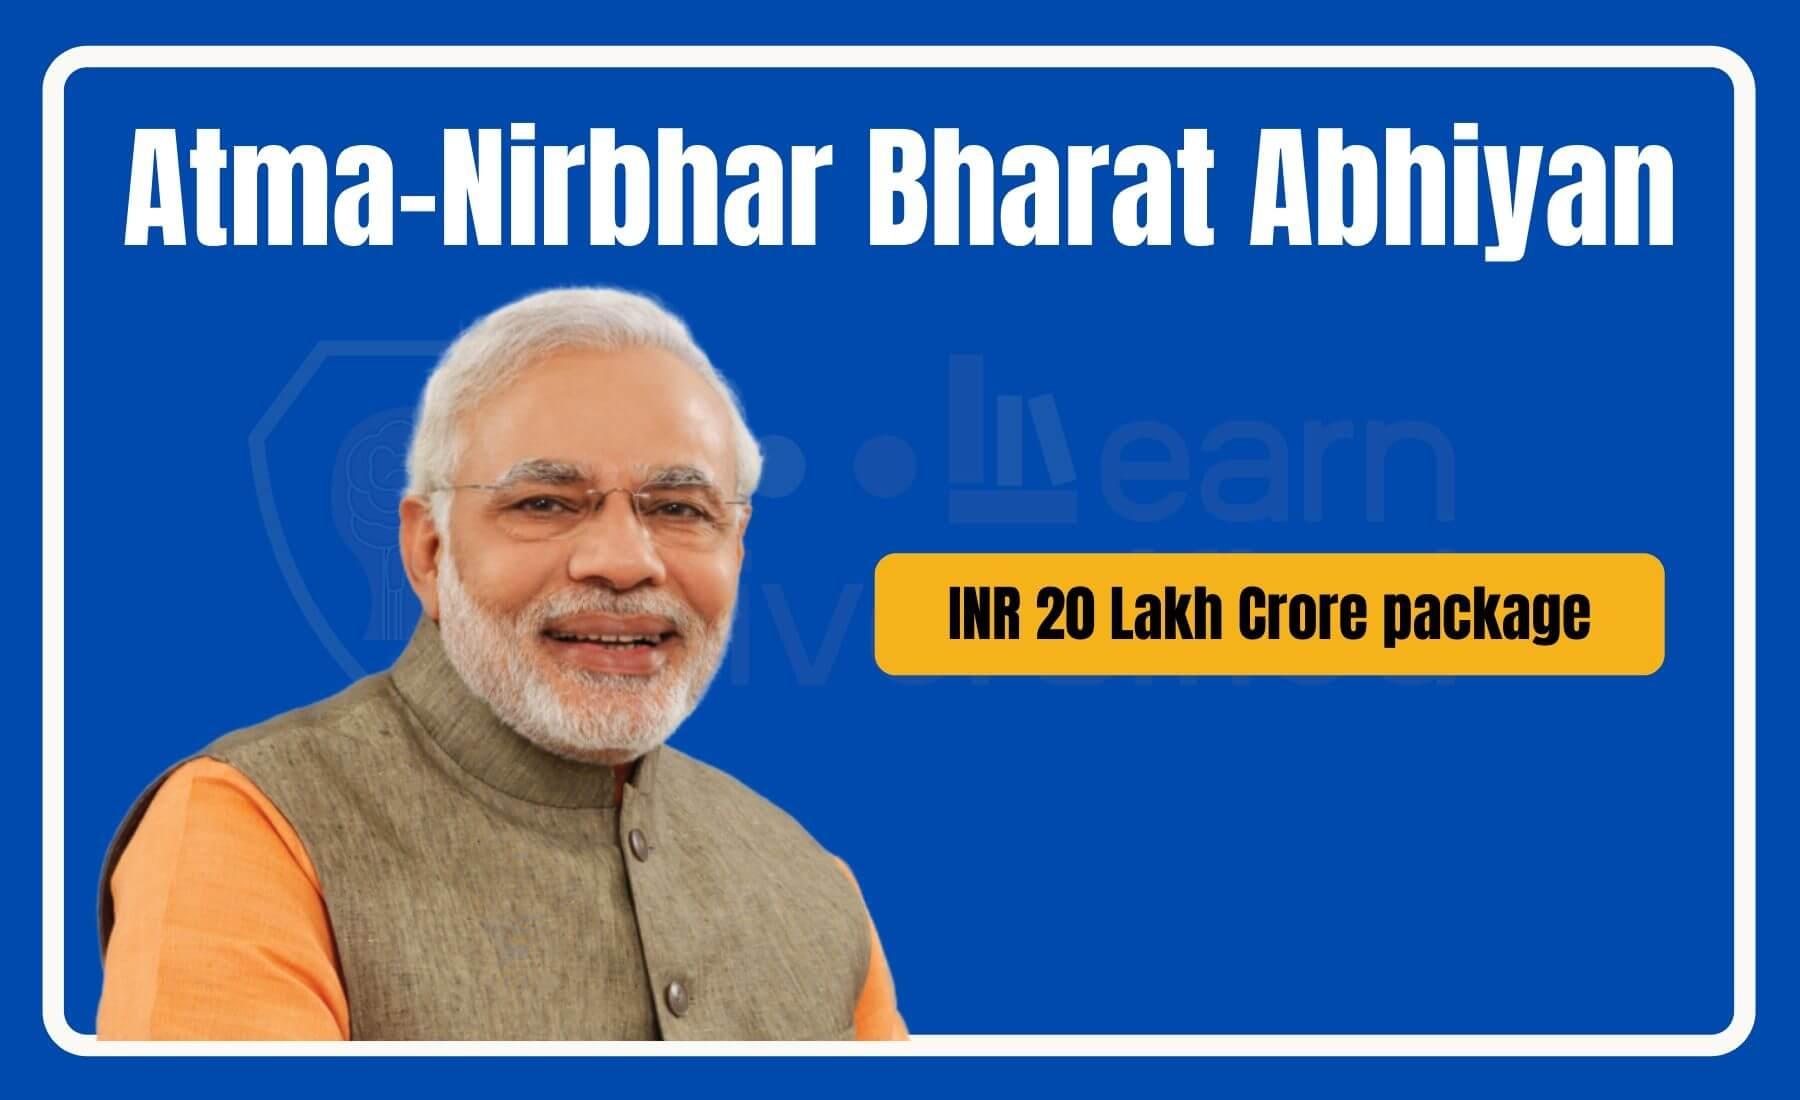 Atma-Nirbhar Bharat package